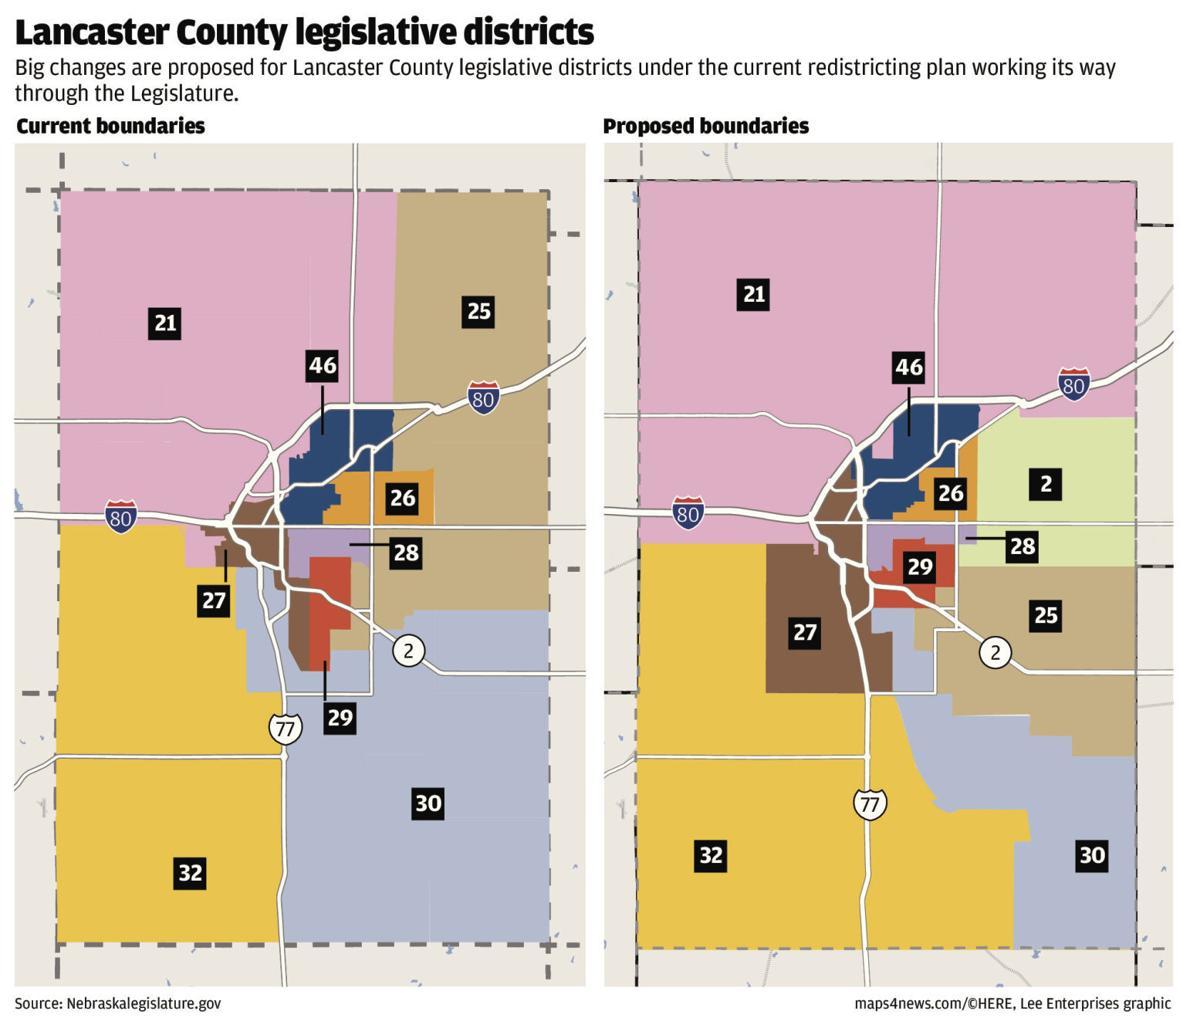 Lincoln/Lancaster County legislative districts